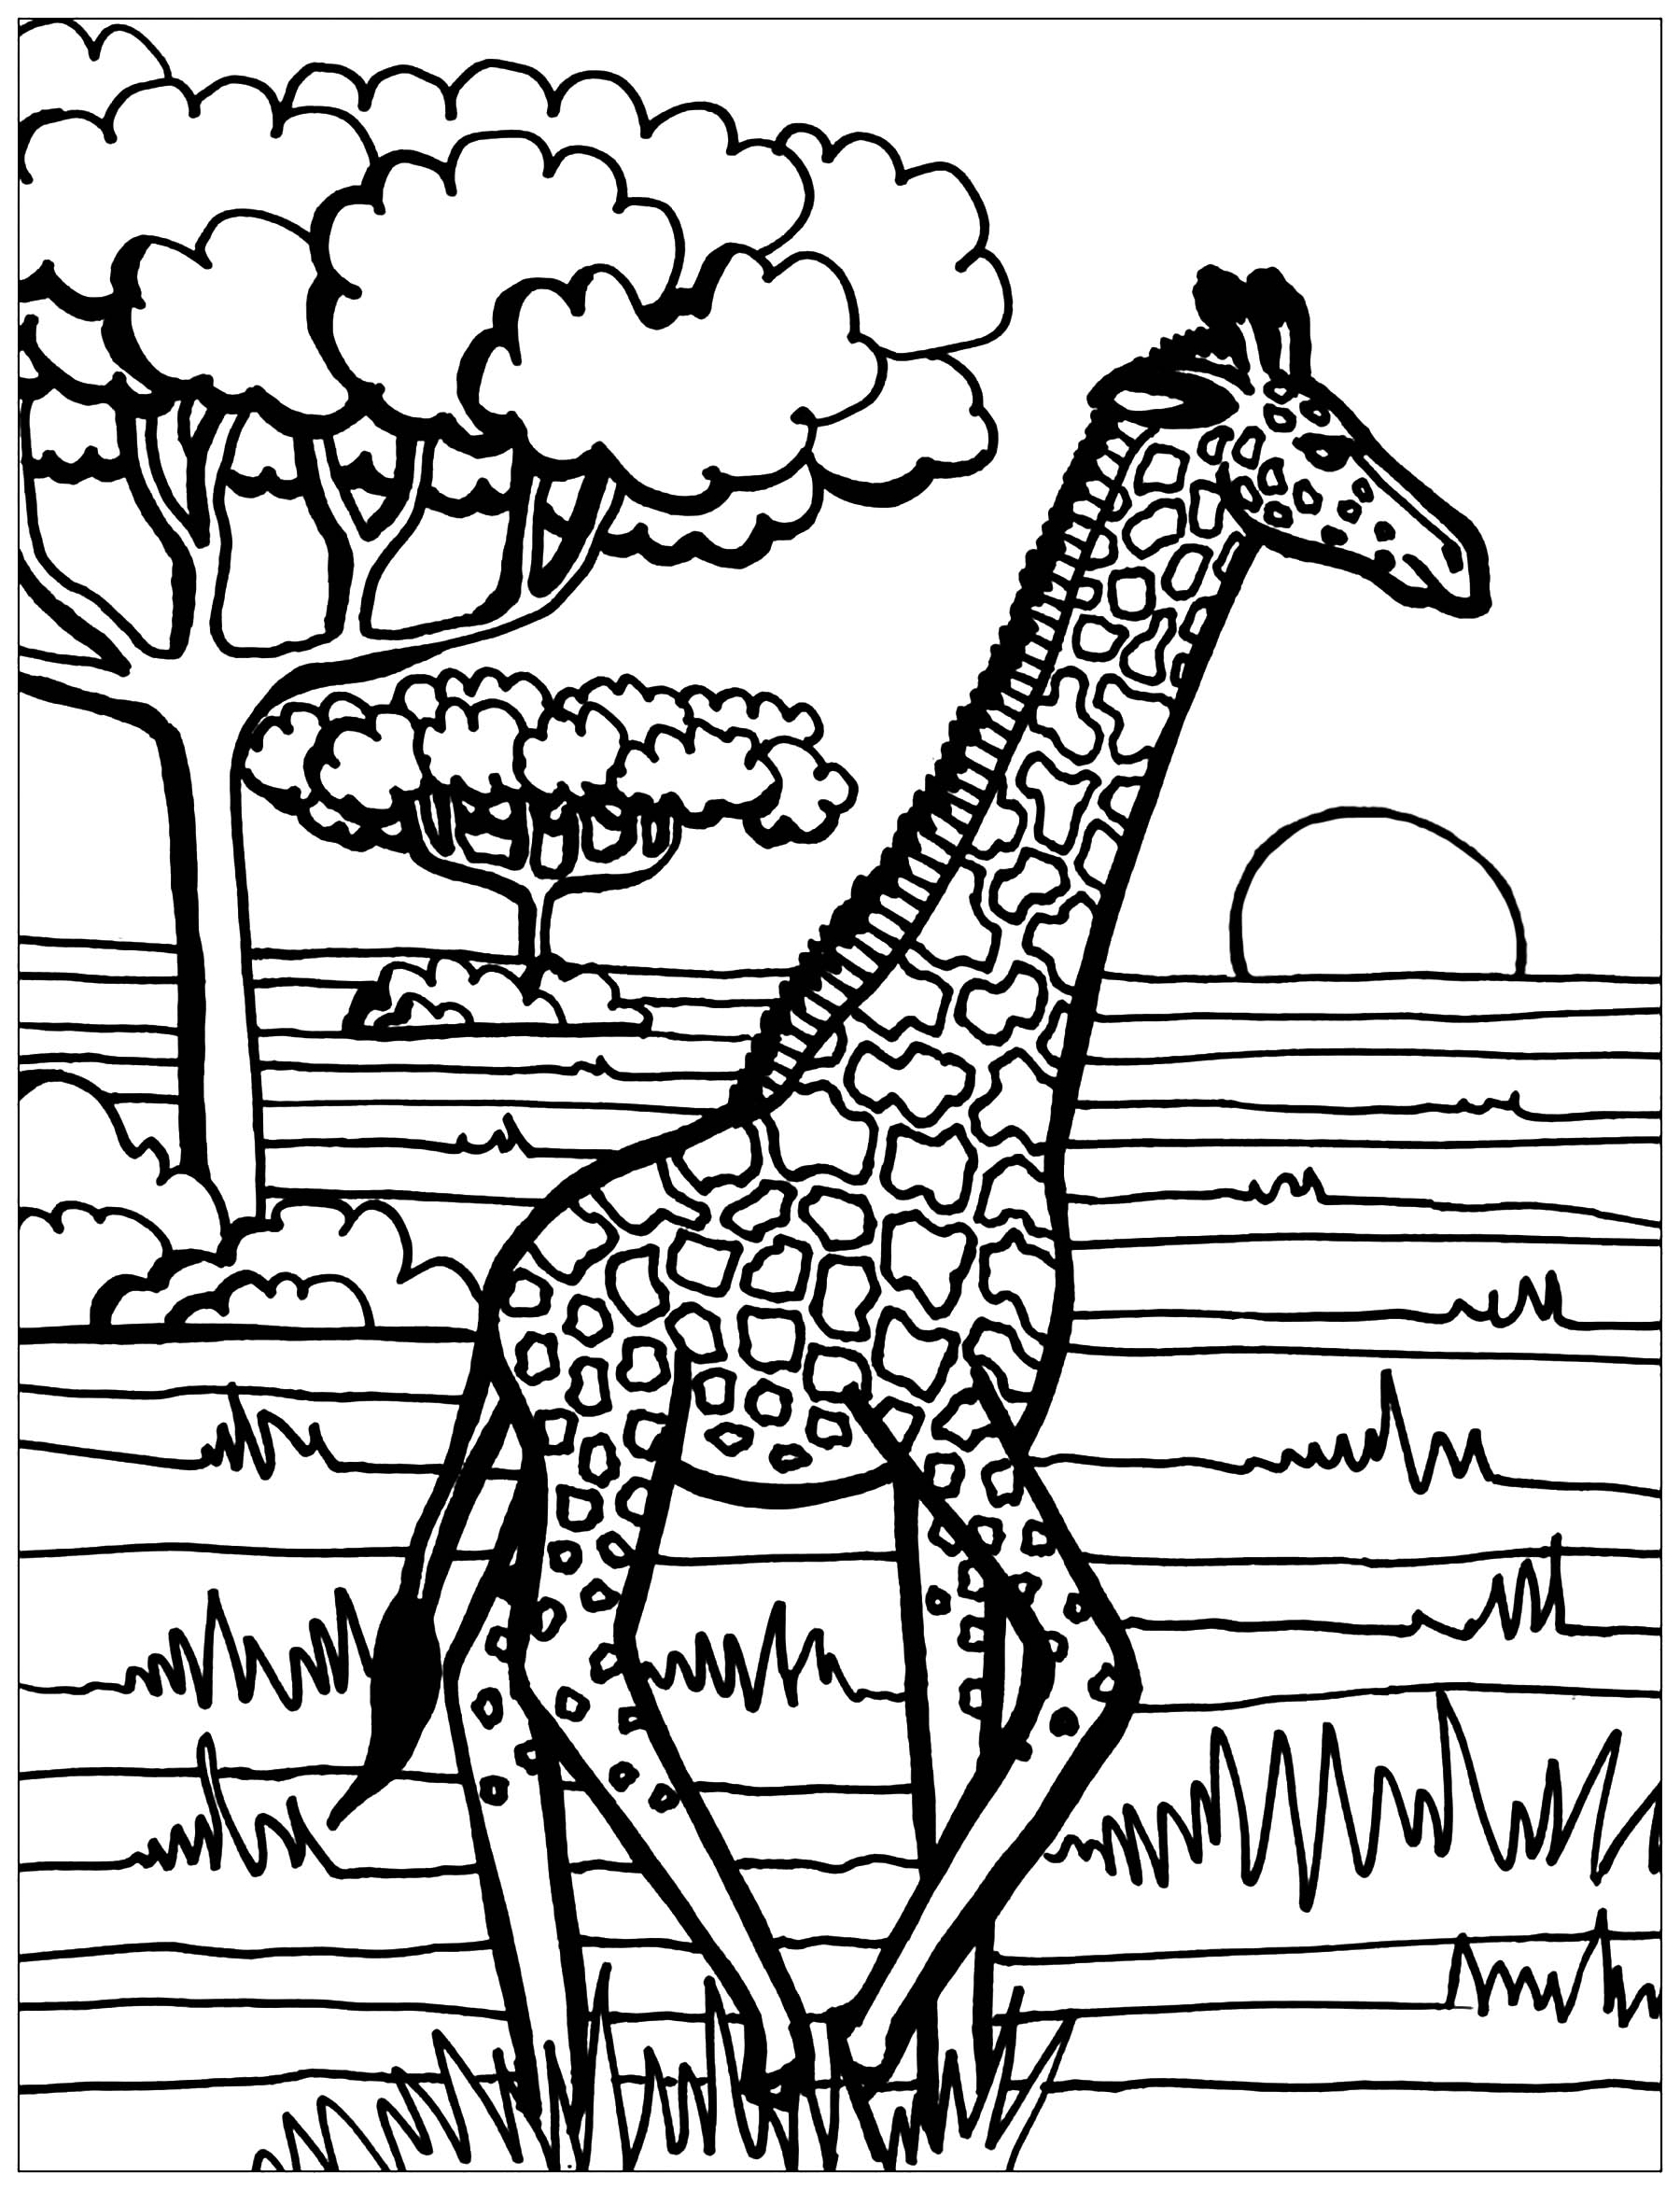 Giraffe coloring page Giraffes